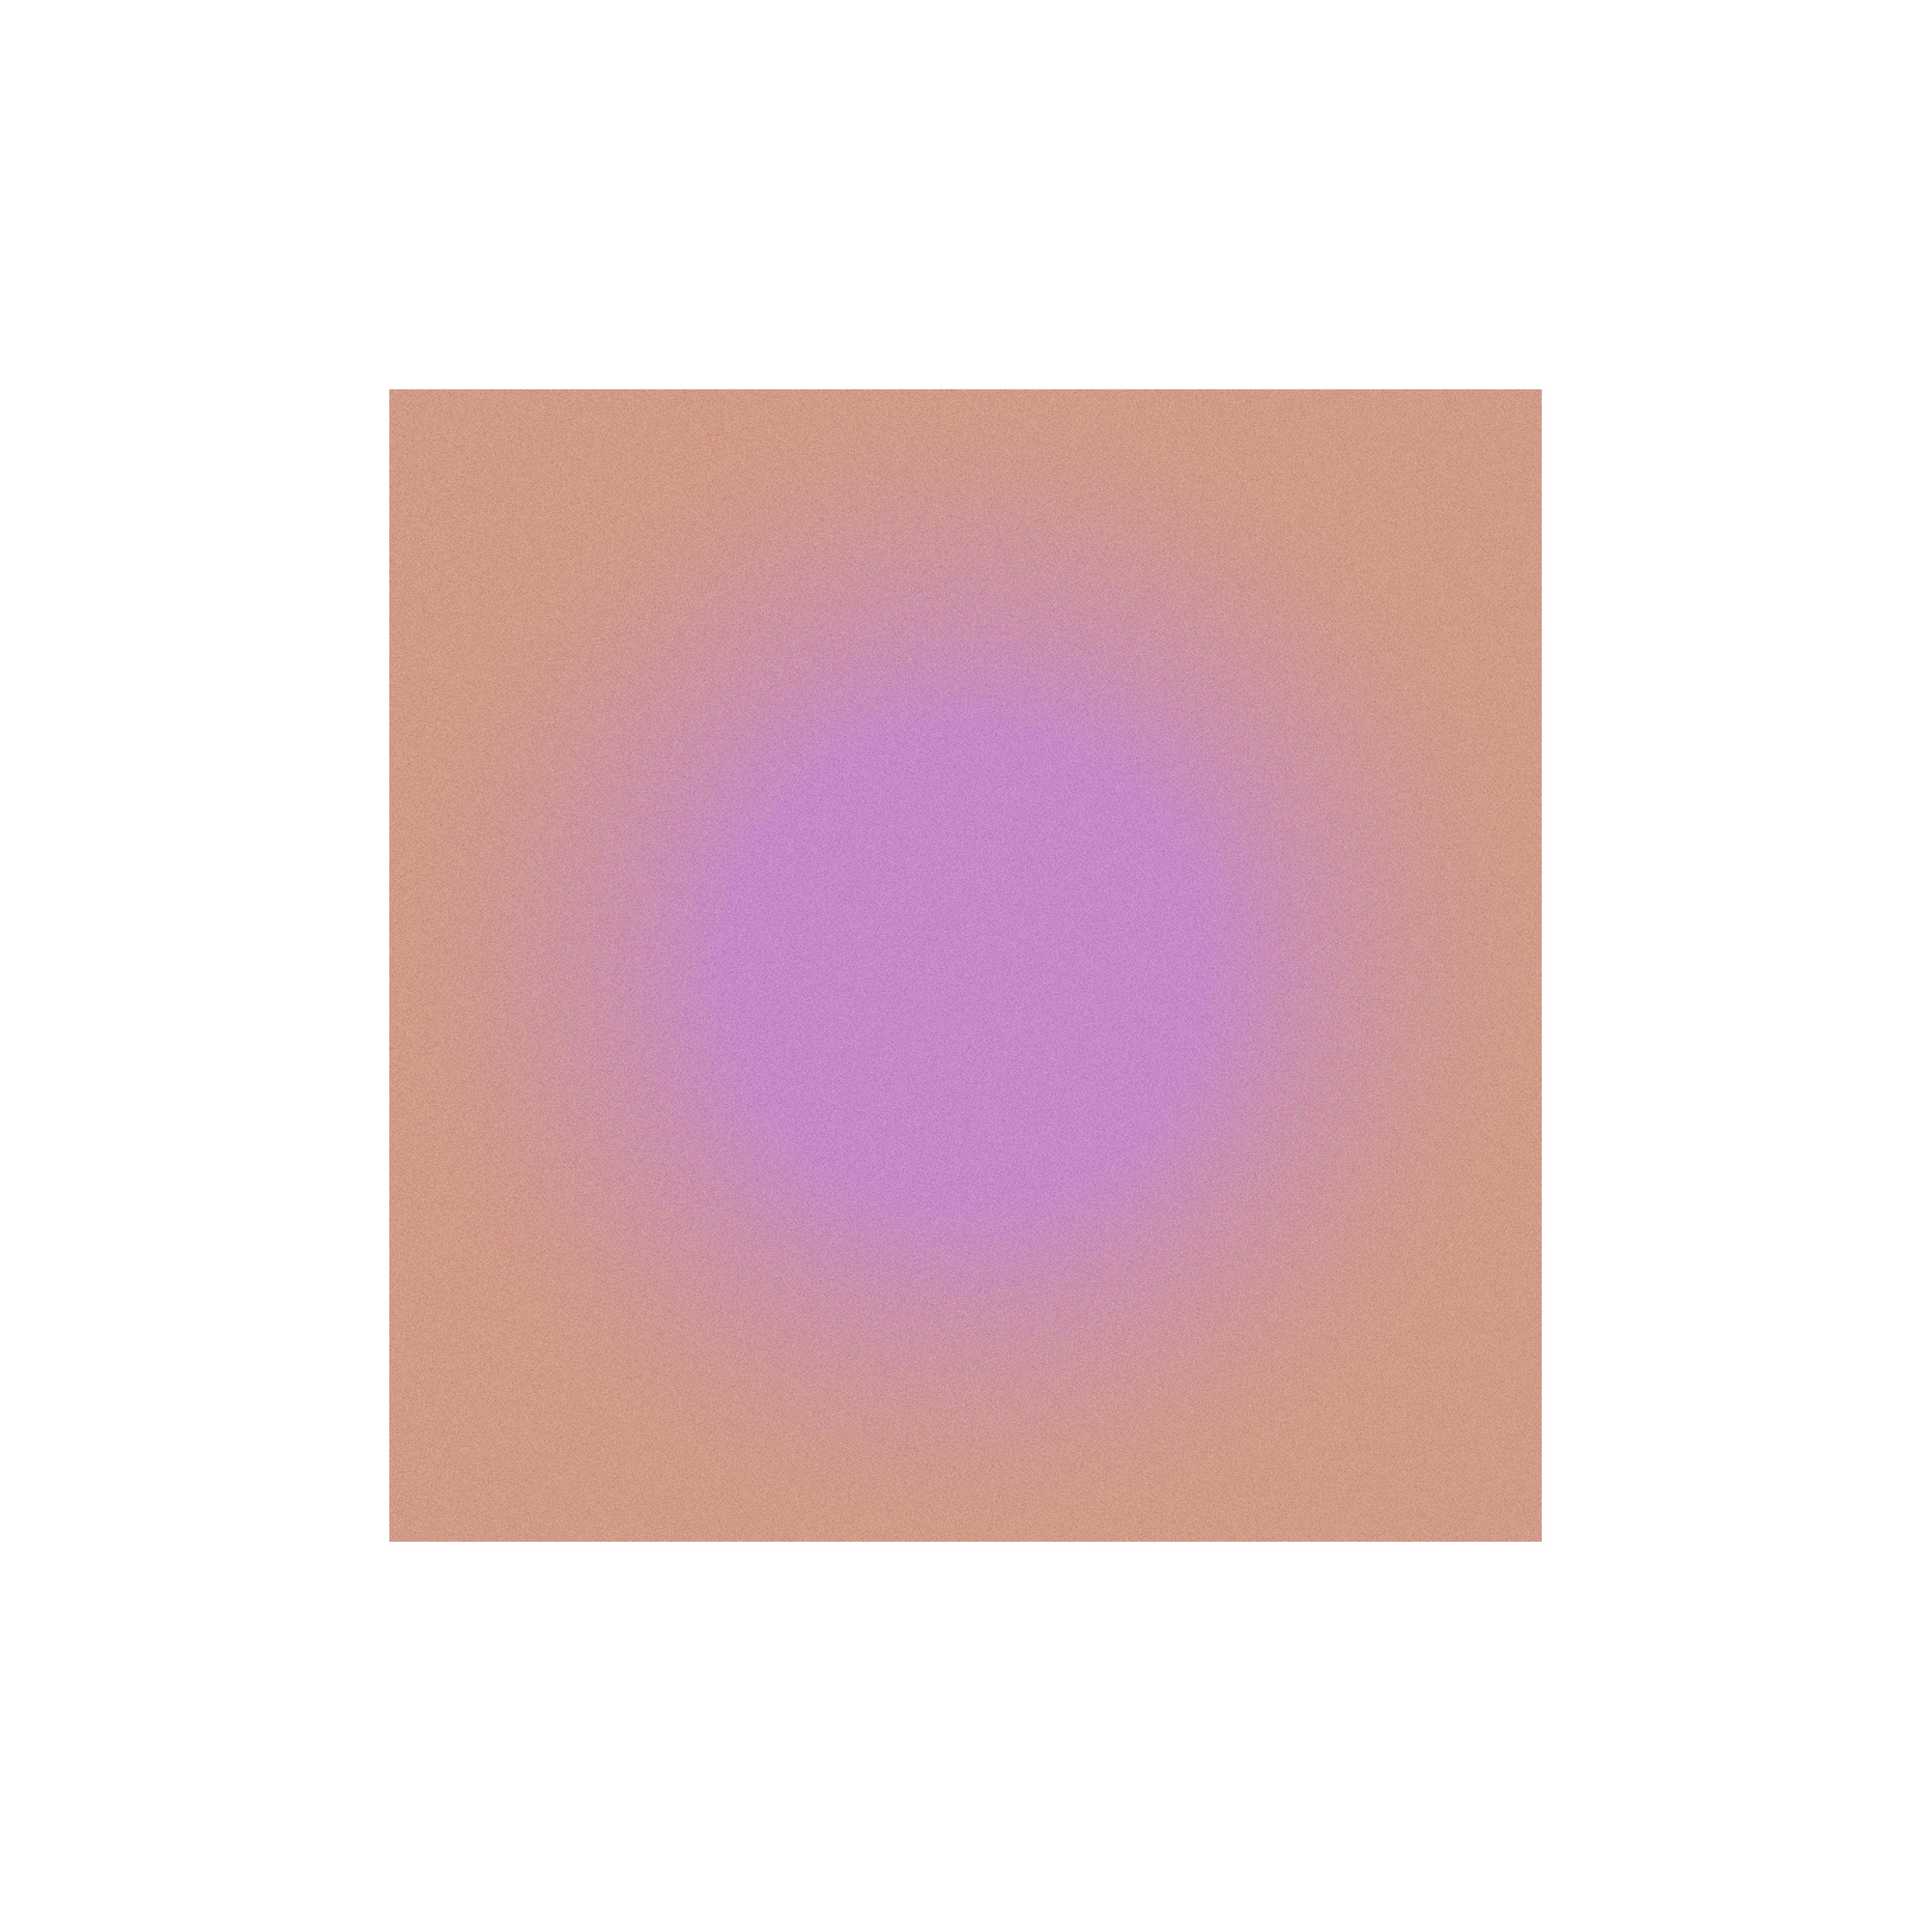 ruxandraduru_color_sqradial_1.jpg